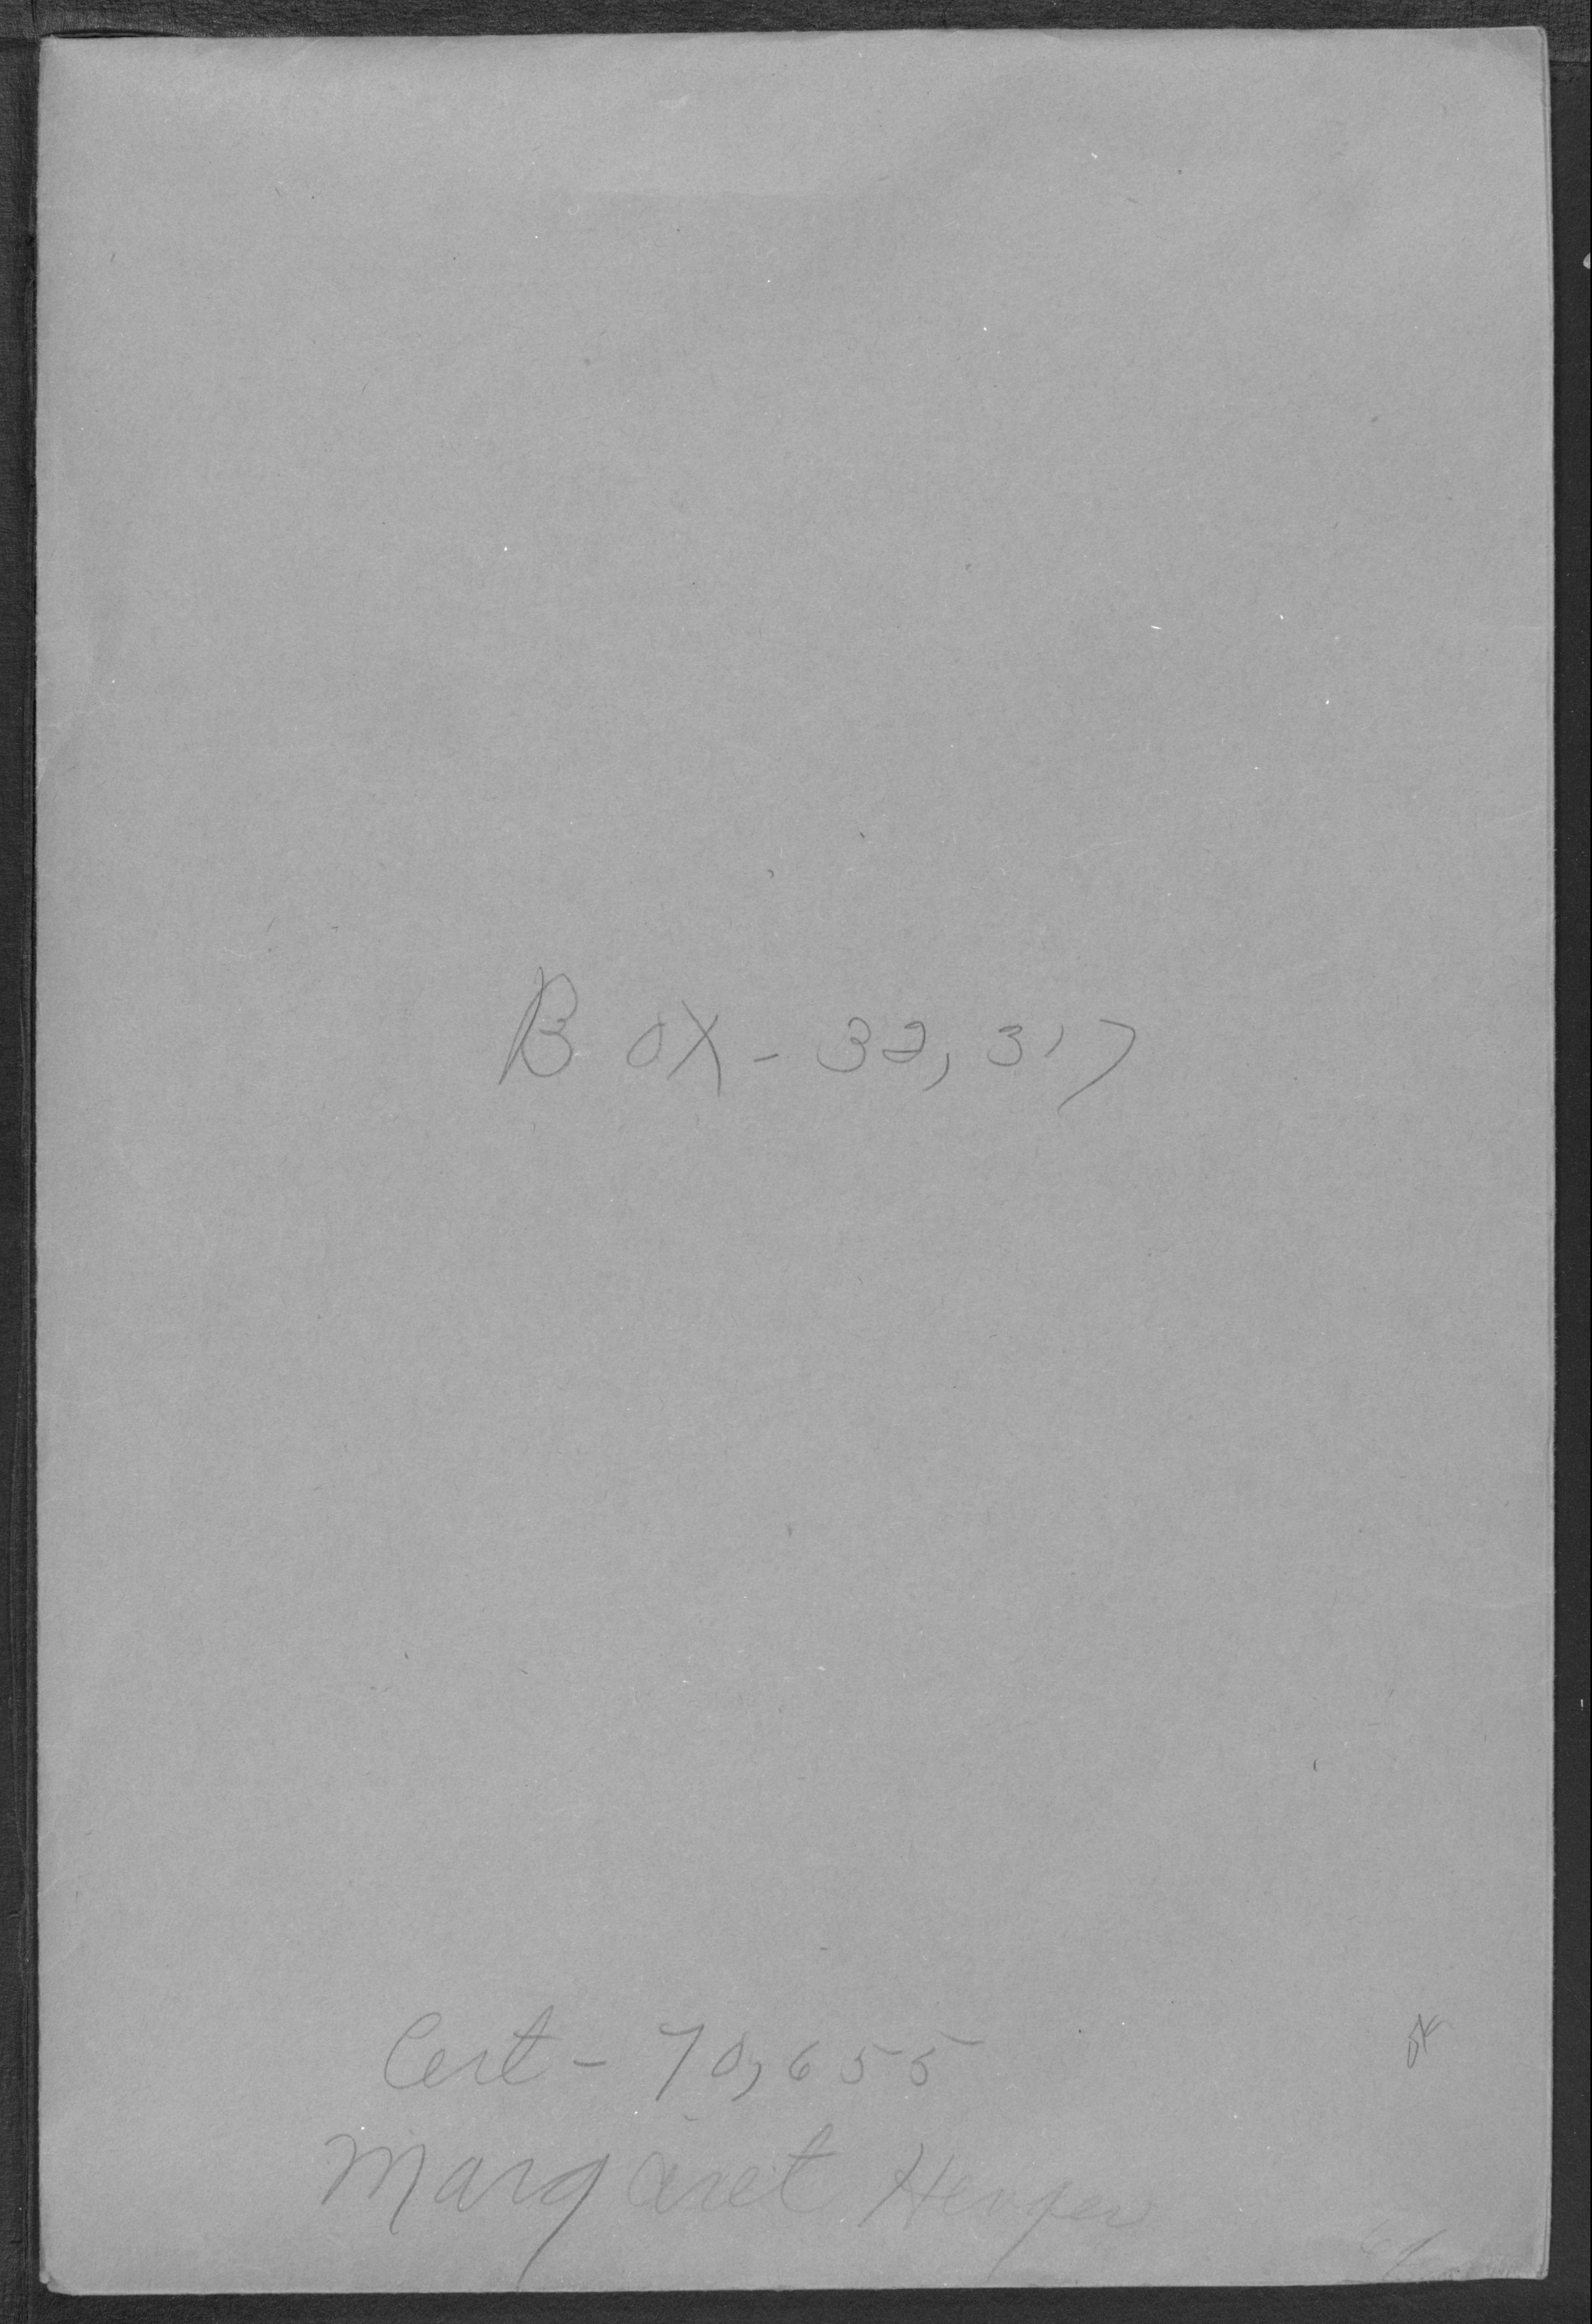 Approved Pension Application File for Margaret Breinig Henger, Widow of Joseph Henger, Company G, 83rd Pennsylvania Infantry Regiment (Application No. WC70655)